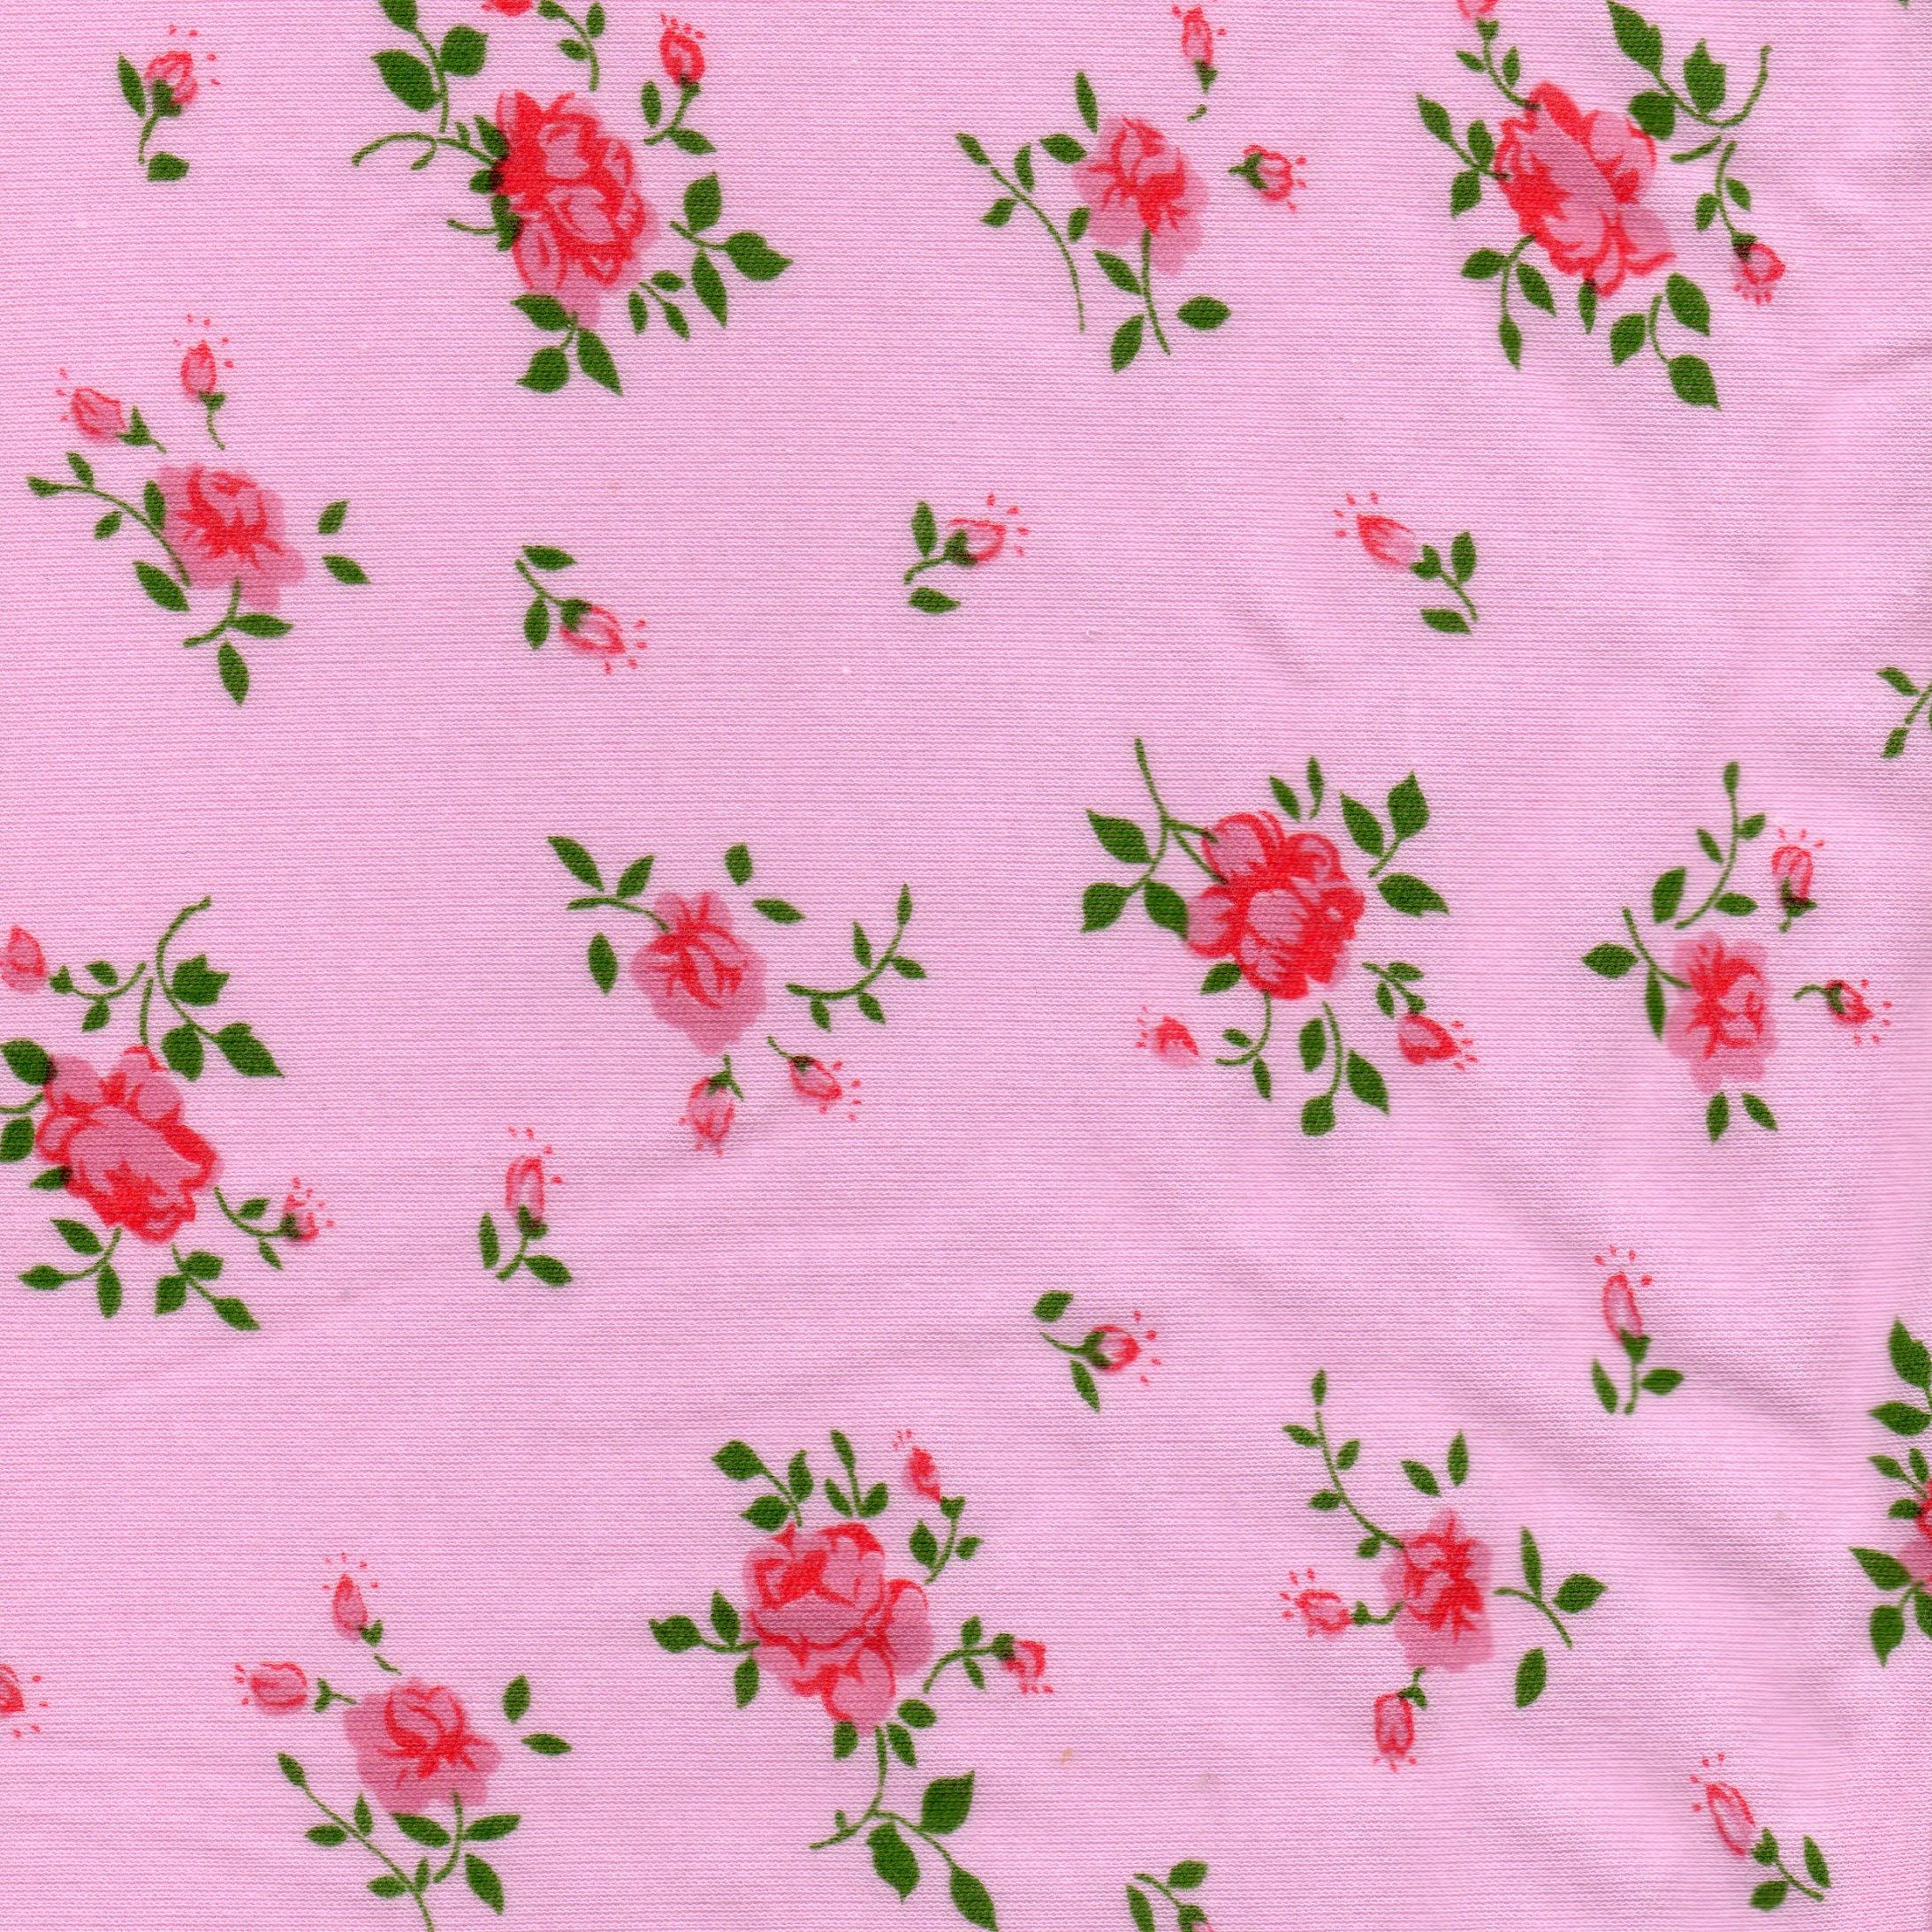 Coton fleuri rose